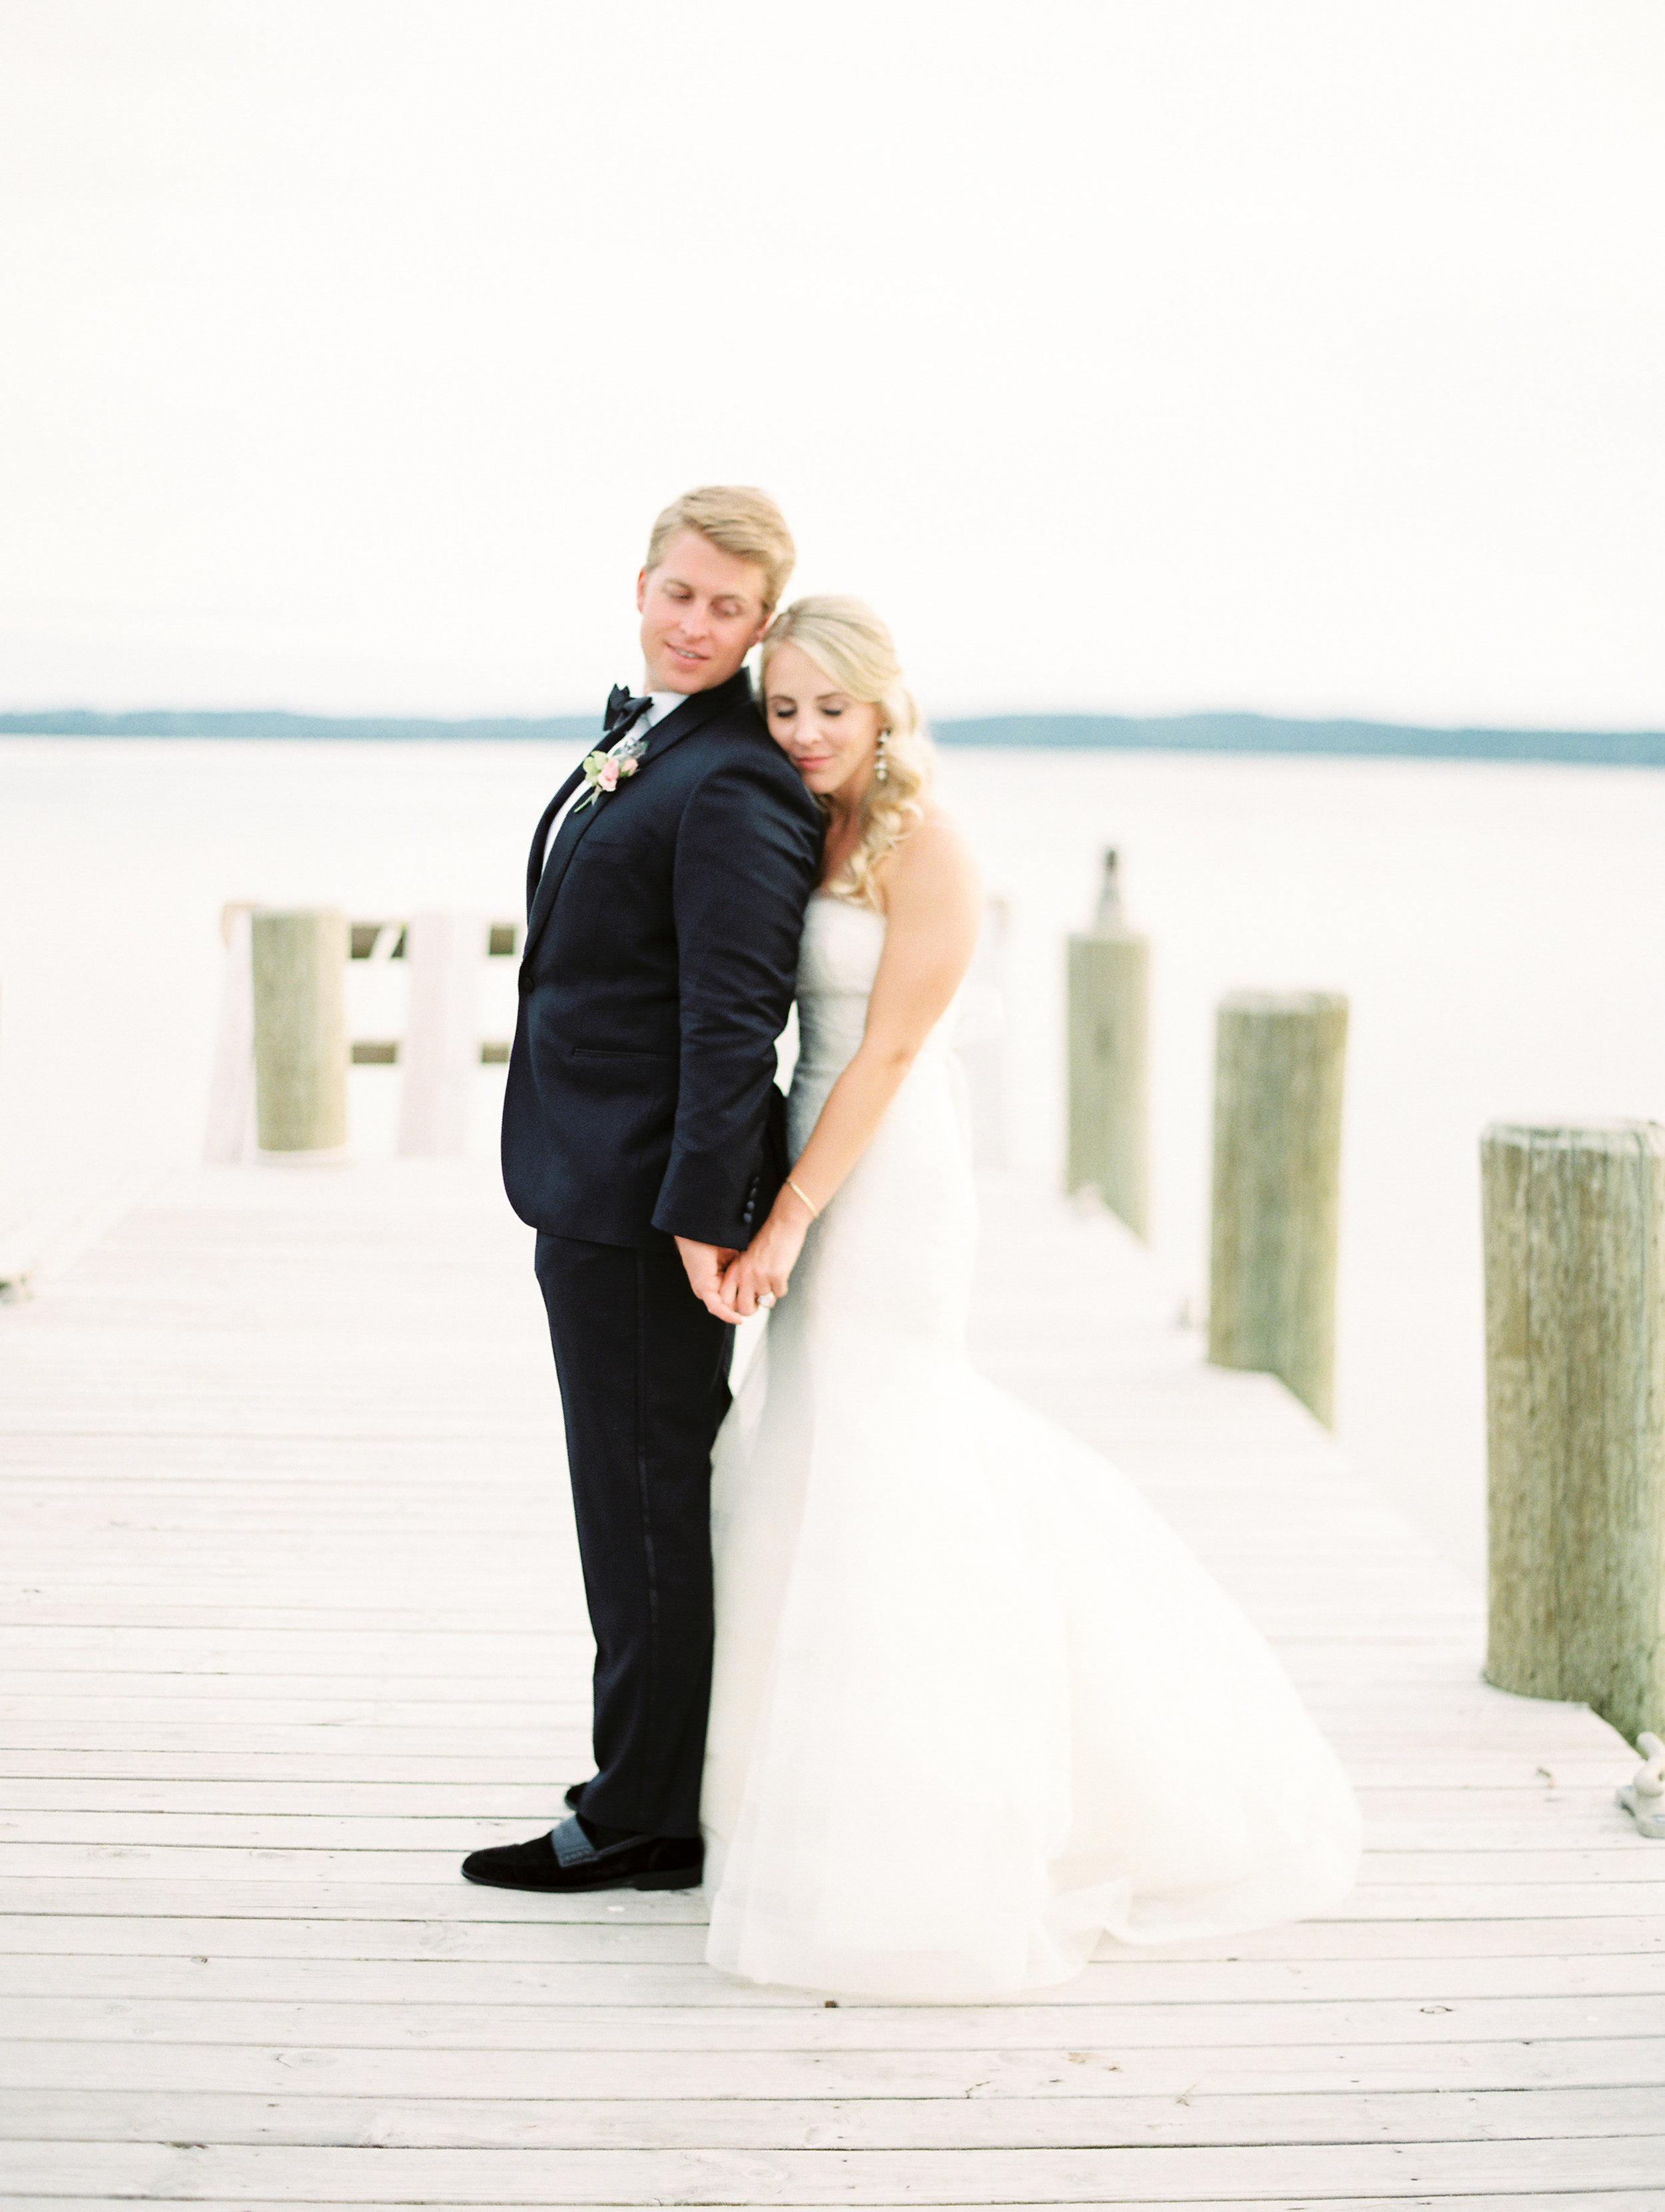 Coffman+Wedding+Bride+Groom+Sunset-55.jpg